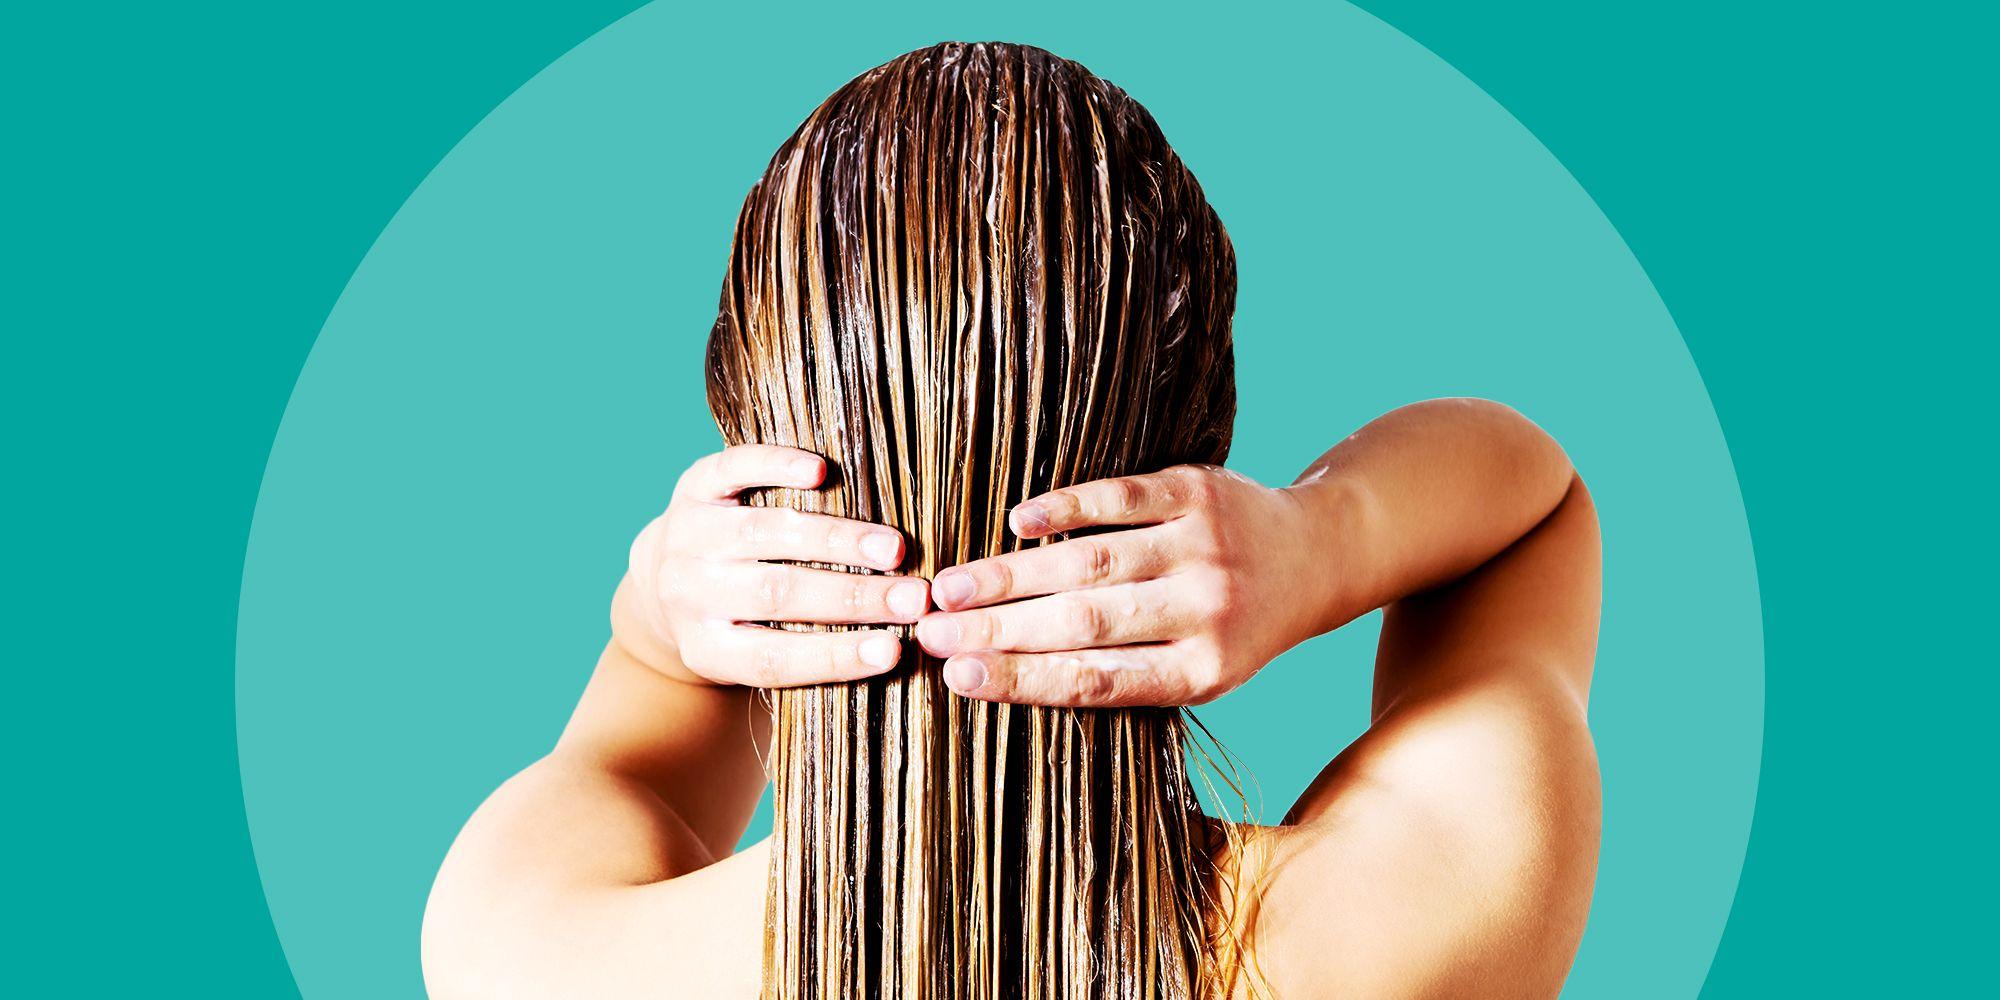 10 Best Hair Masks For Dry Hair In 2018 Nourishing Hair Masks And